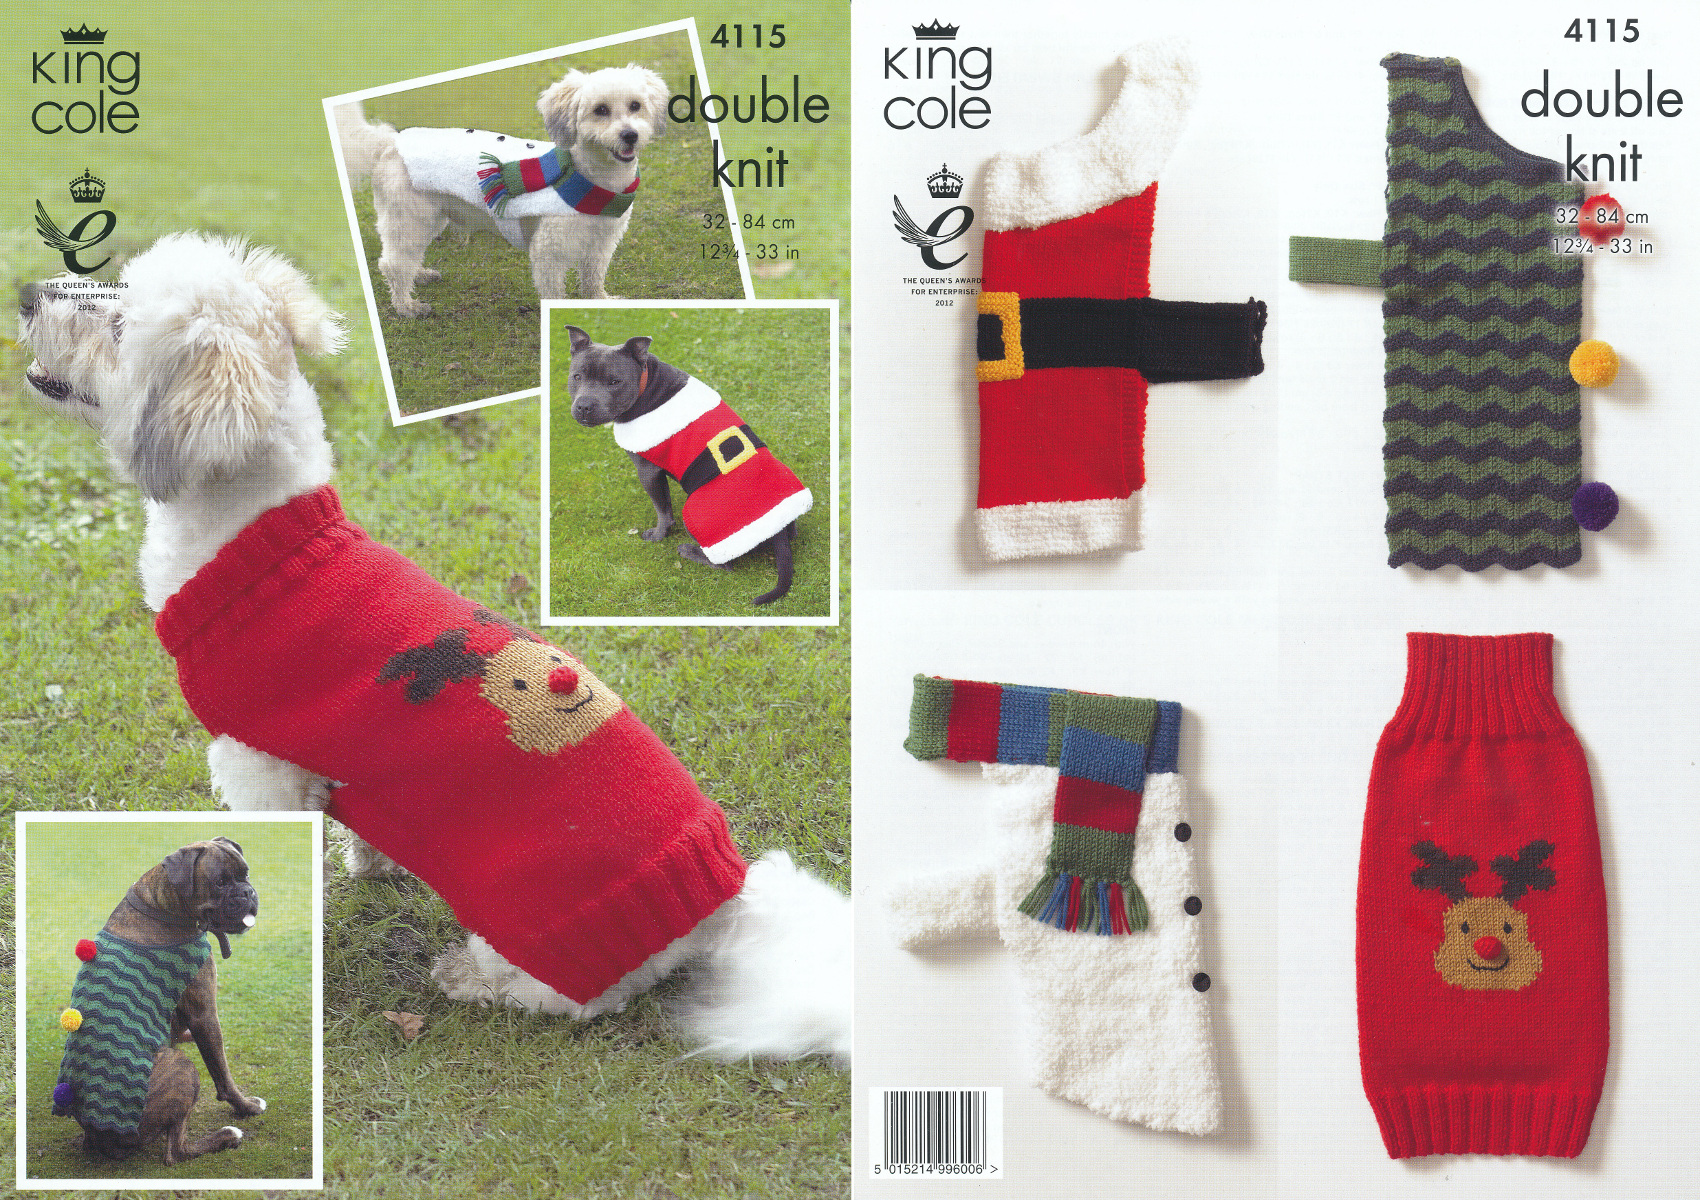 King Cole Snowman Knitting Pattern : King Cole Double Knitting Pattern Dog Coats Snowman Santa Rudolph Xmas Tree 4...